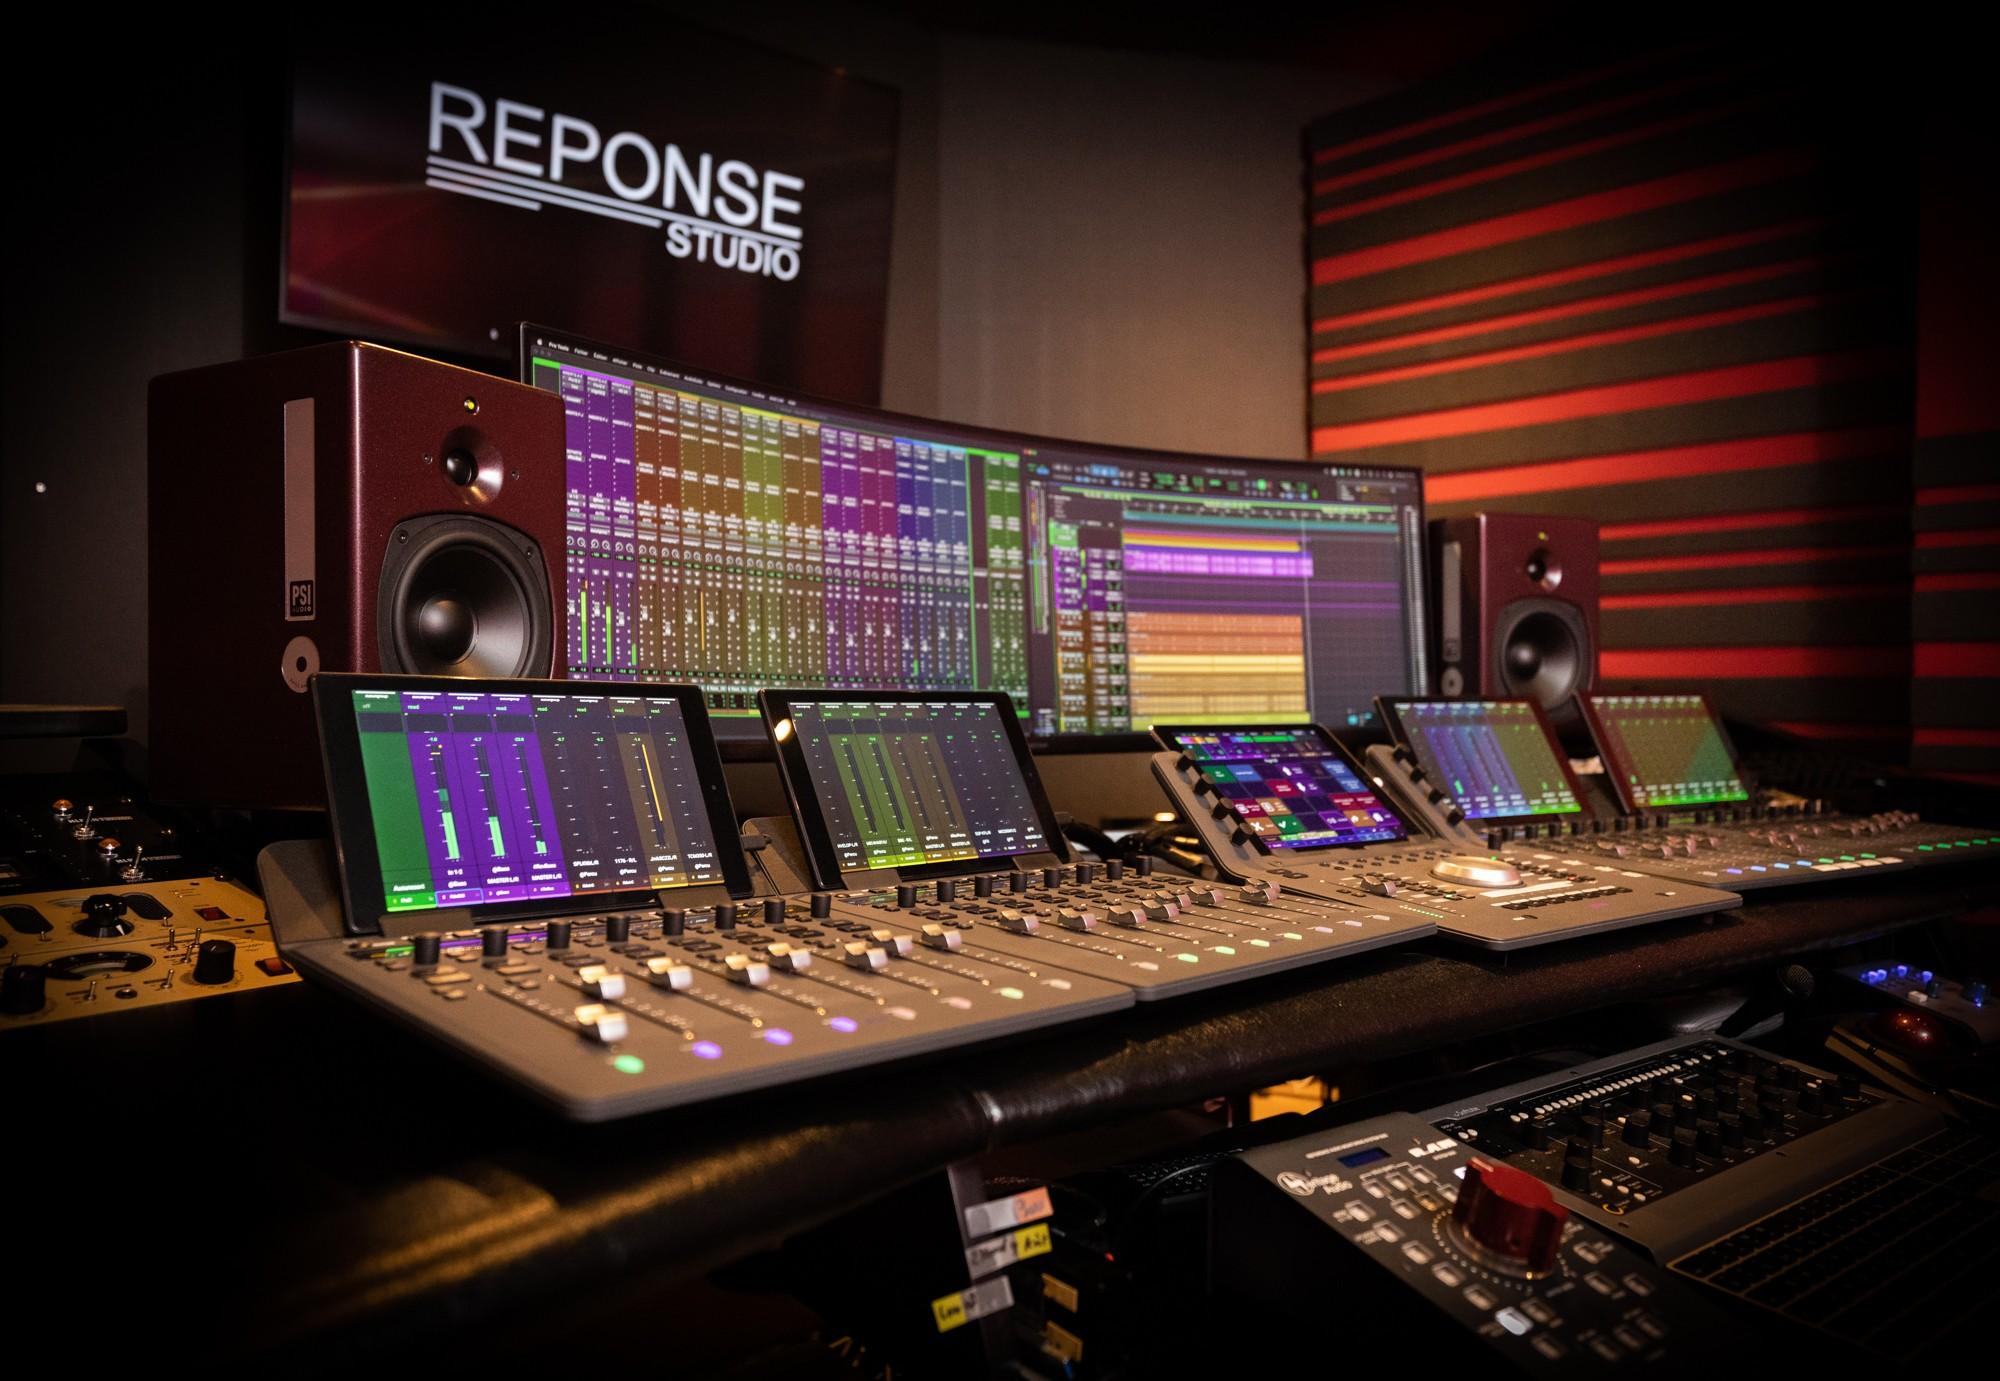 New A17-M at Reponse Studio